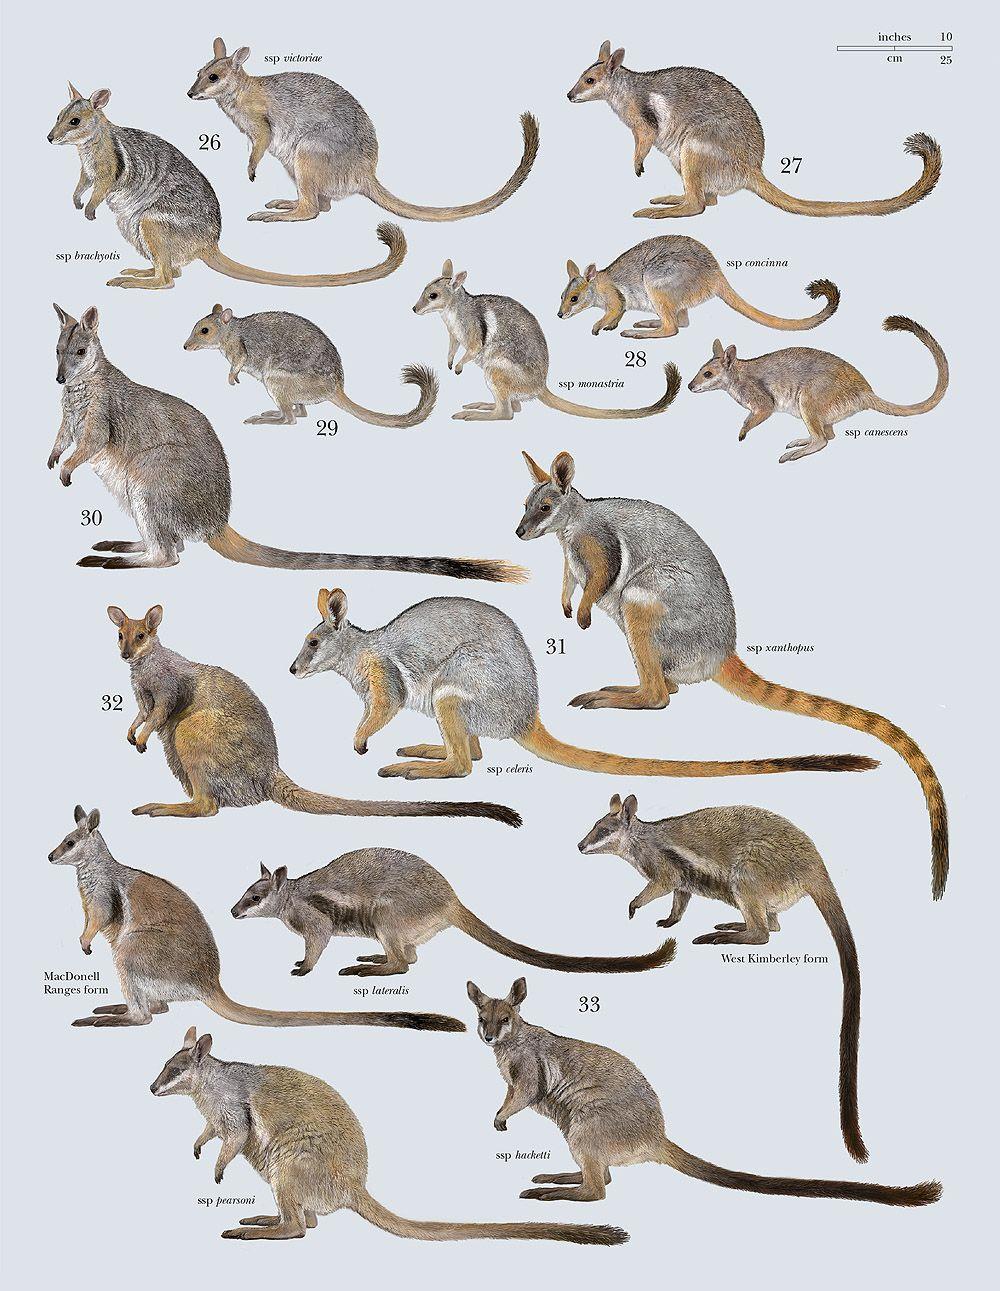 Family Macropodidae (Kangaroos and Wallabies) | posters | Pinterest ...